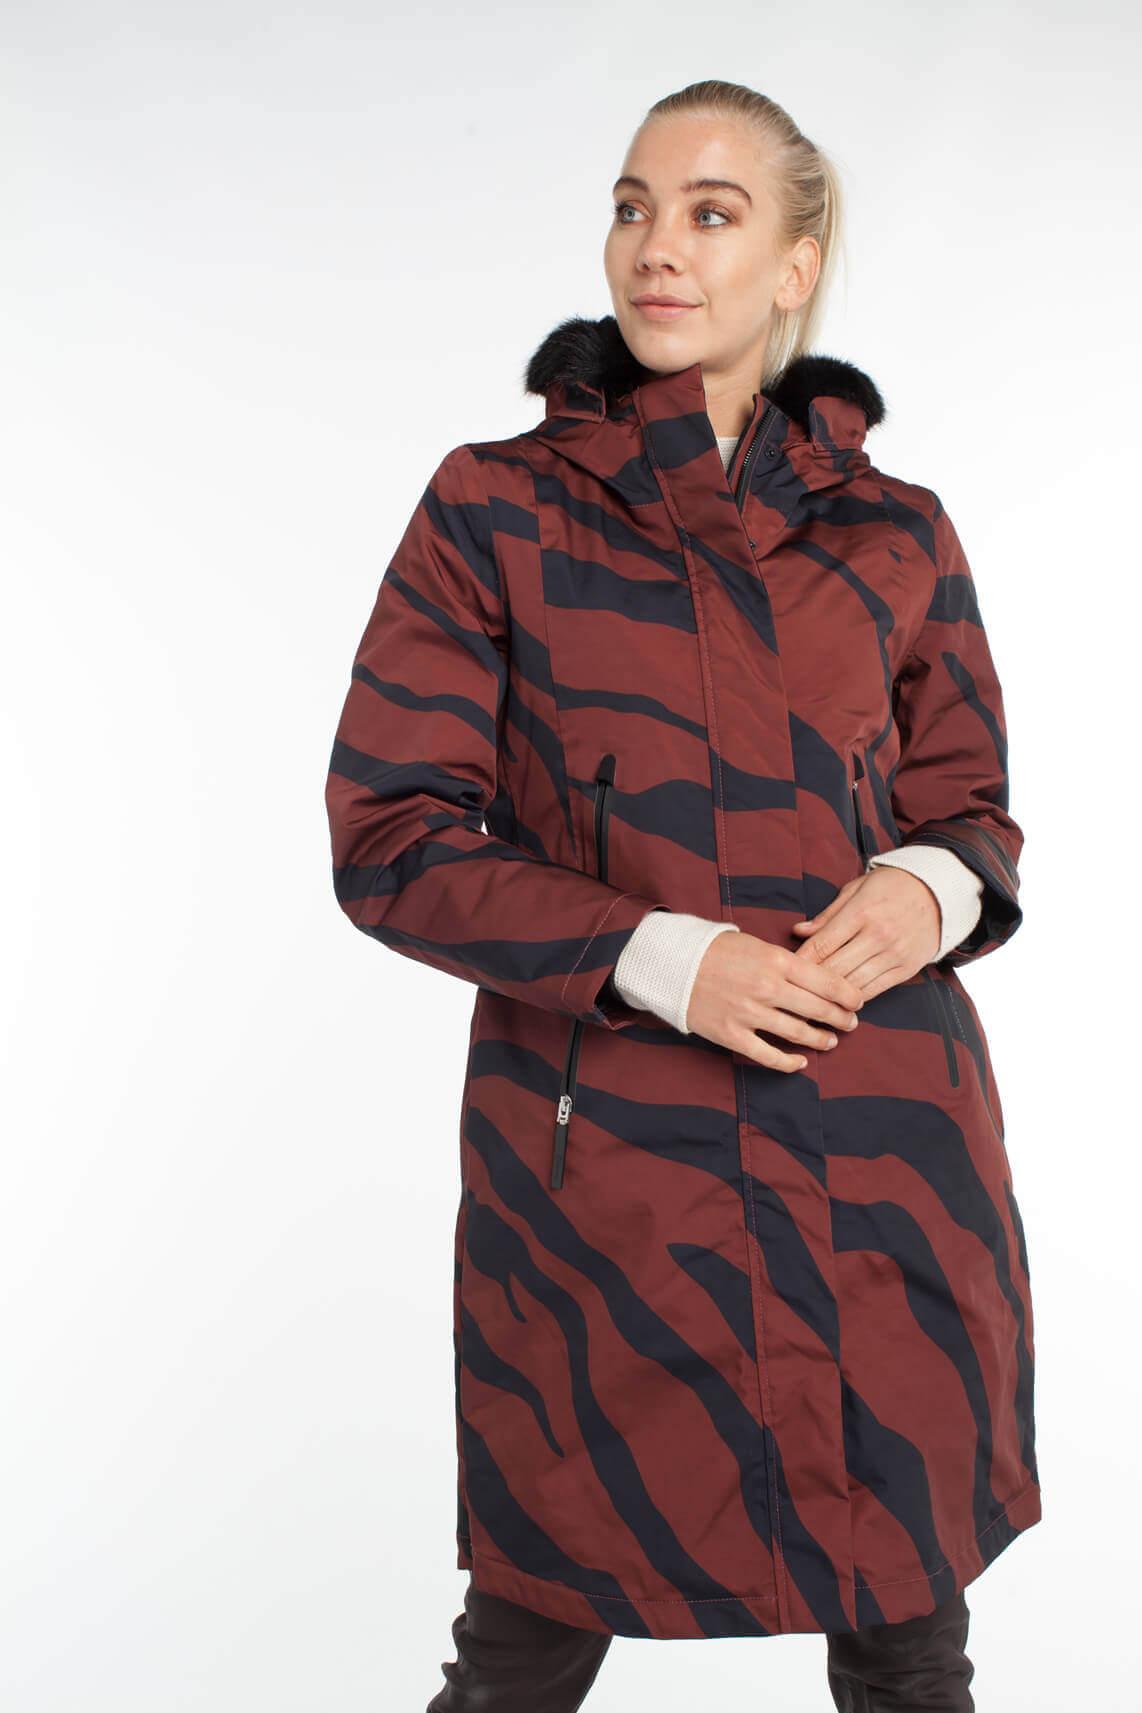 Giacomo Dames Waterproof jas met animalprint Rood